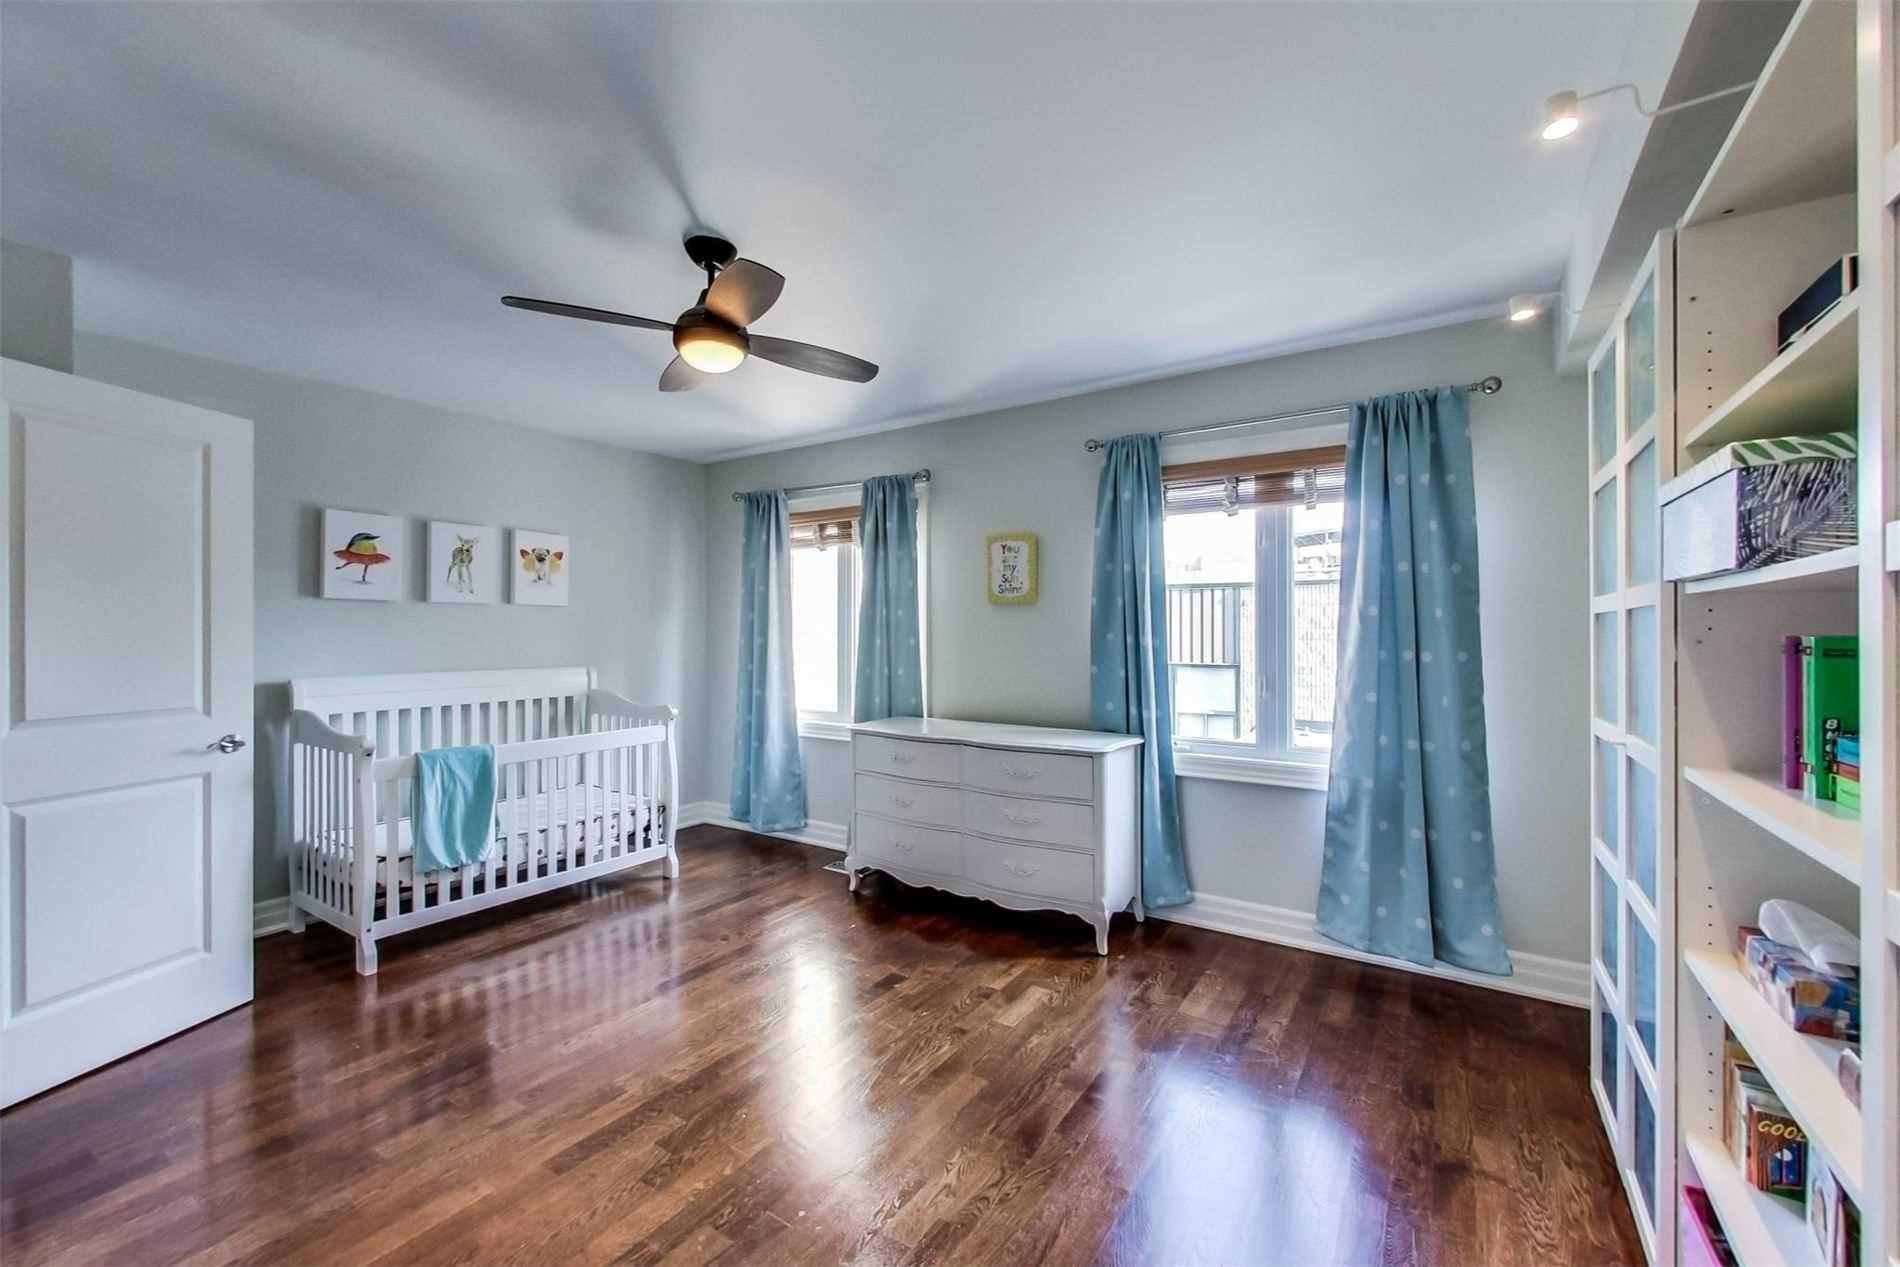 Photo 19: Photos: 213 Heward Avenue in Toronto: South Riverdale House (3-Storey) for sale (Toronto E01)  : MLS®# E4941877